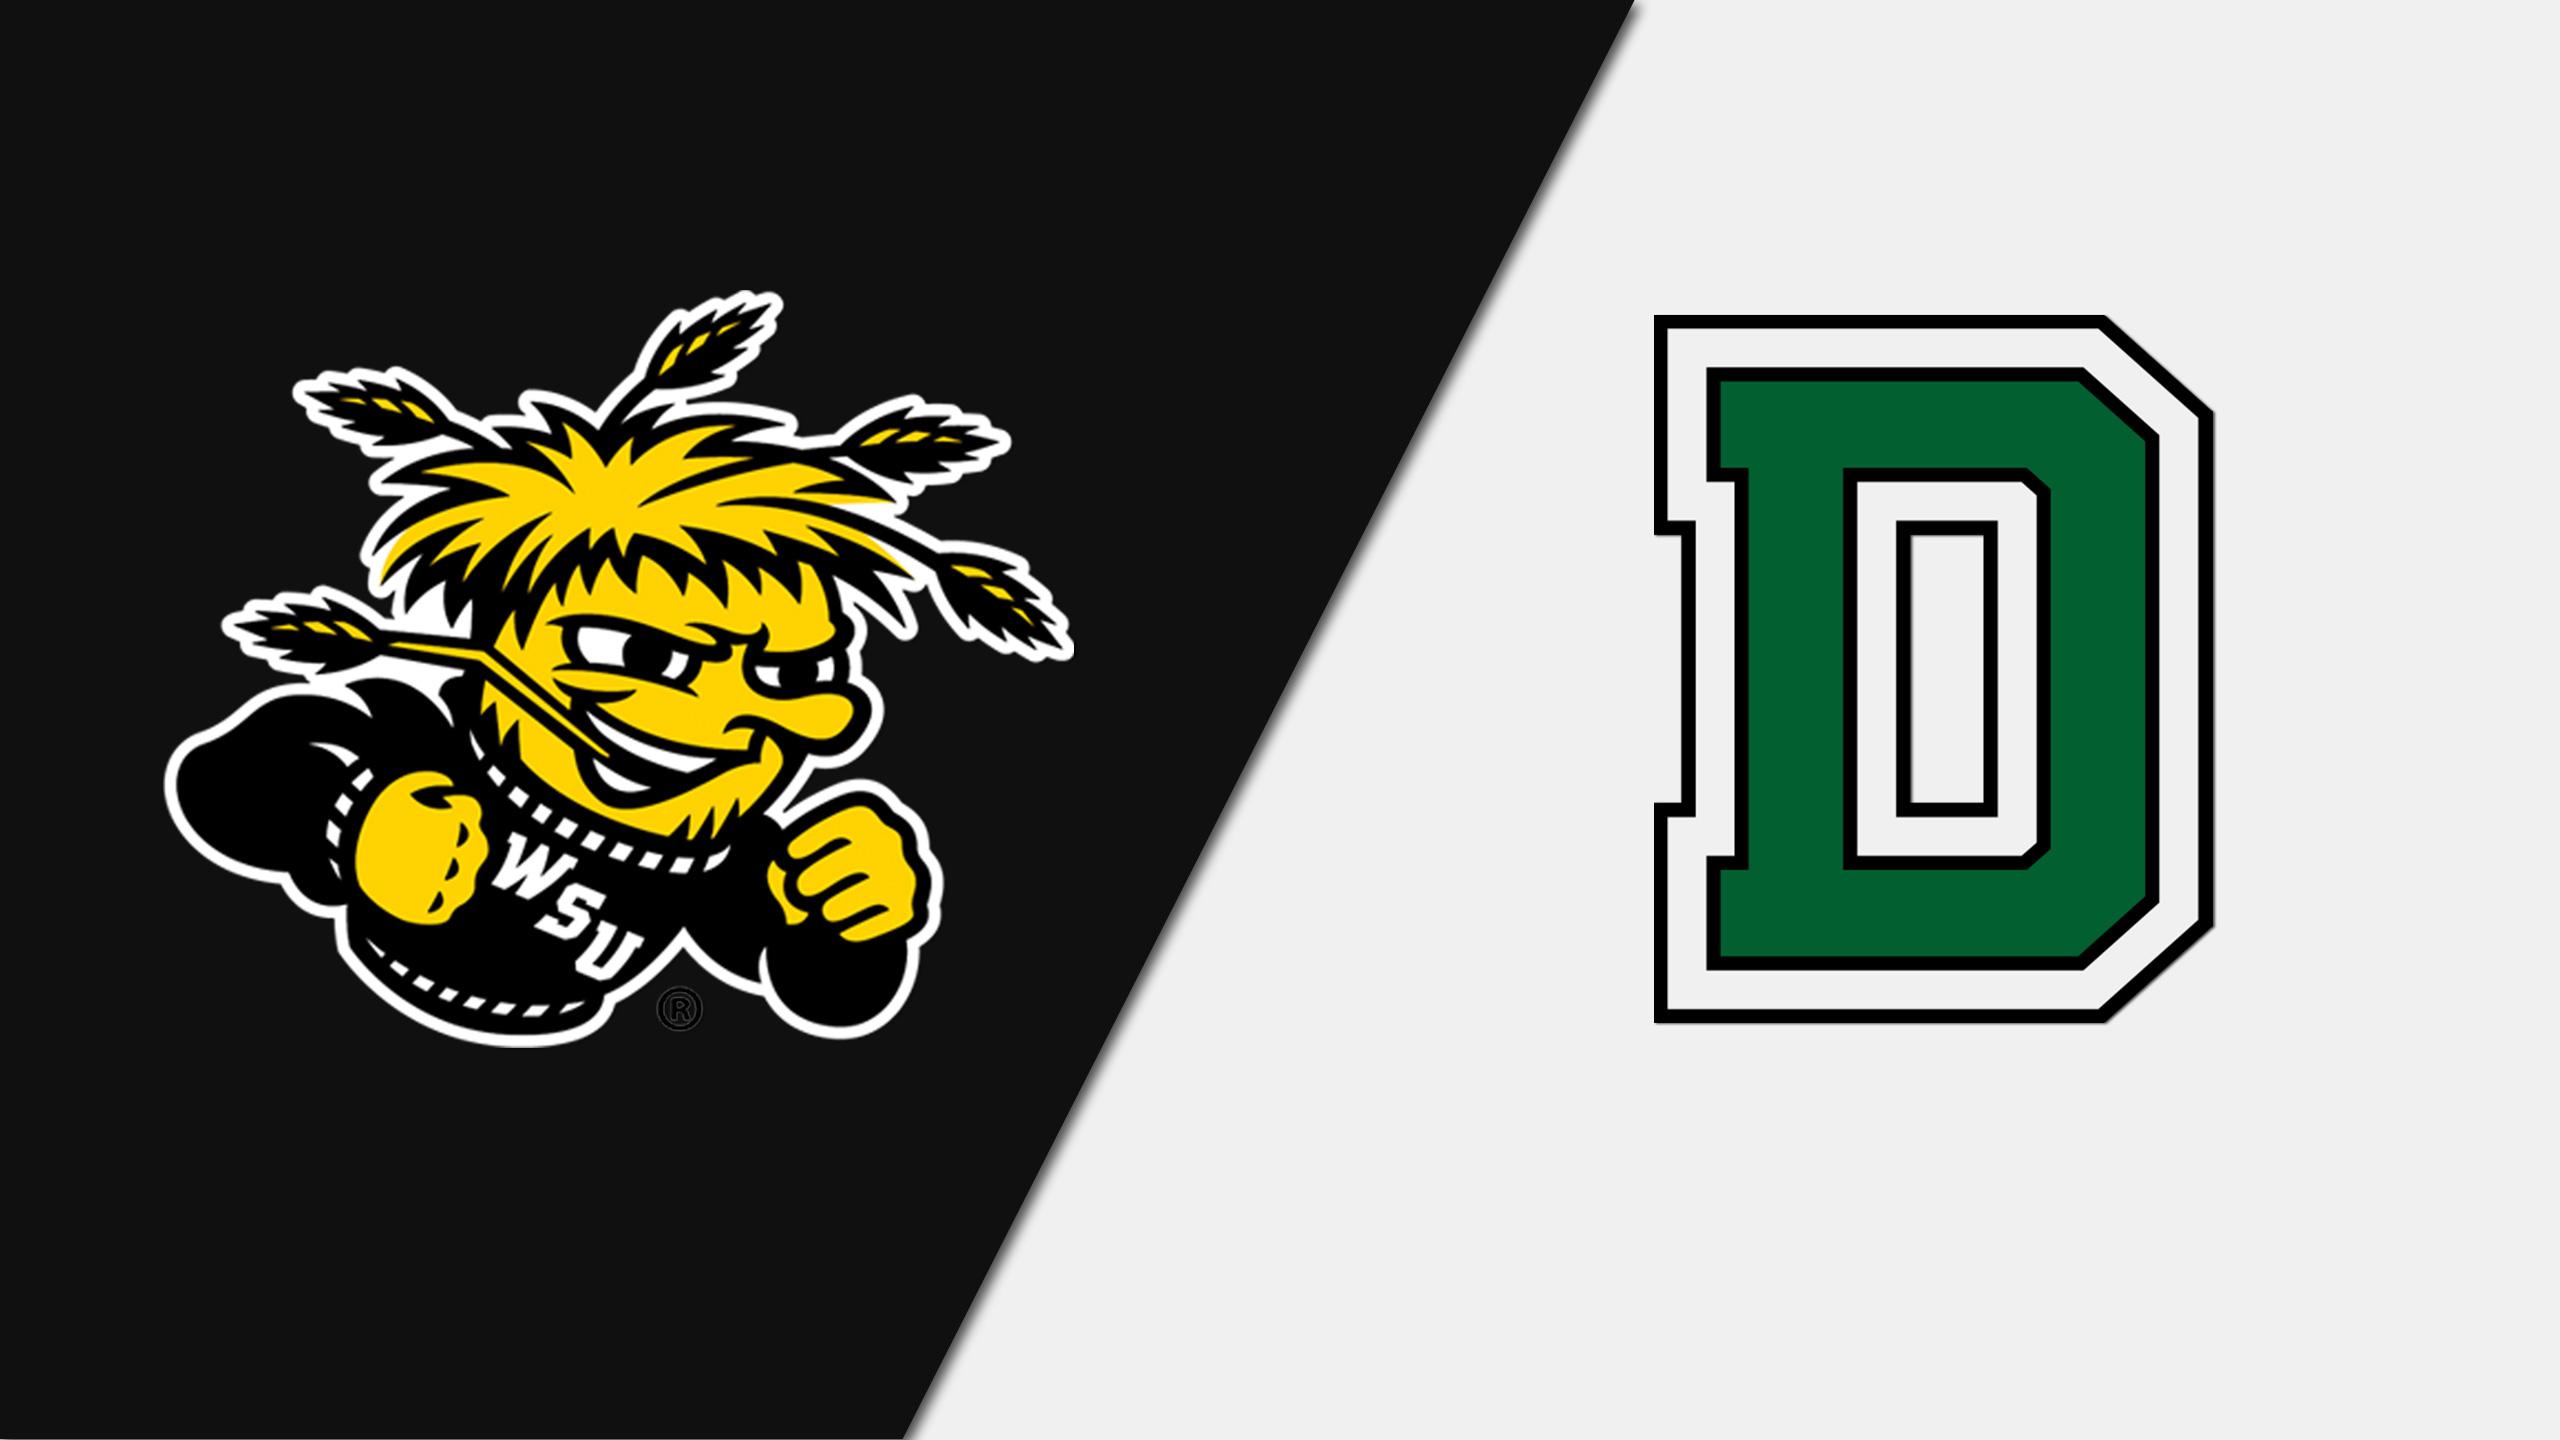 Wichita State vs. Dartmouth (Court 4)